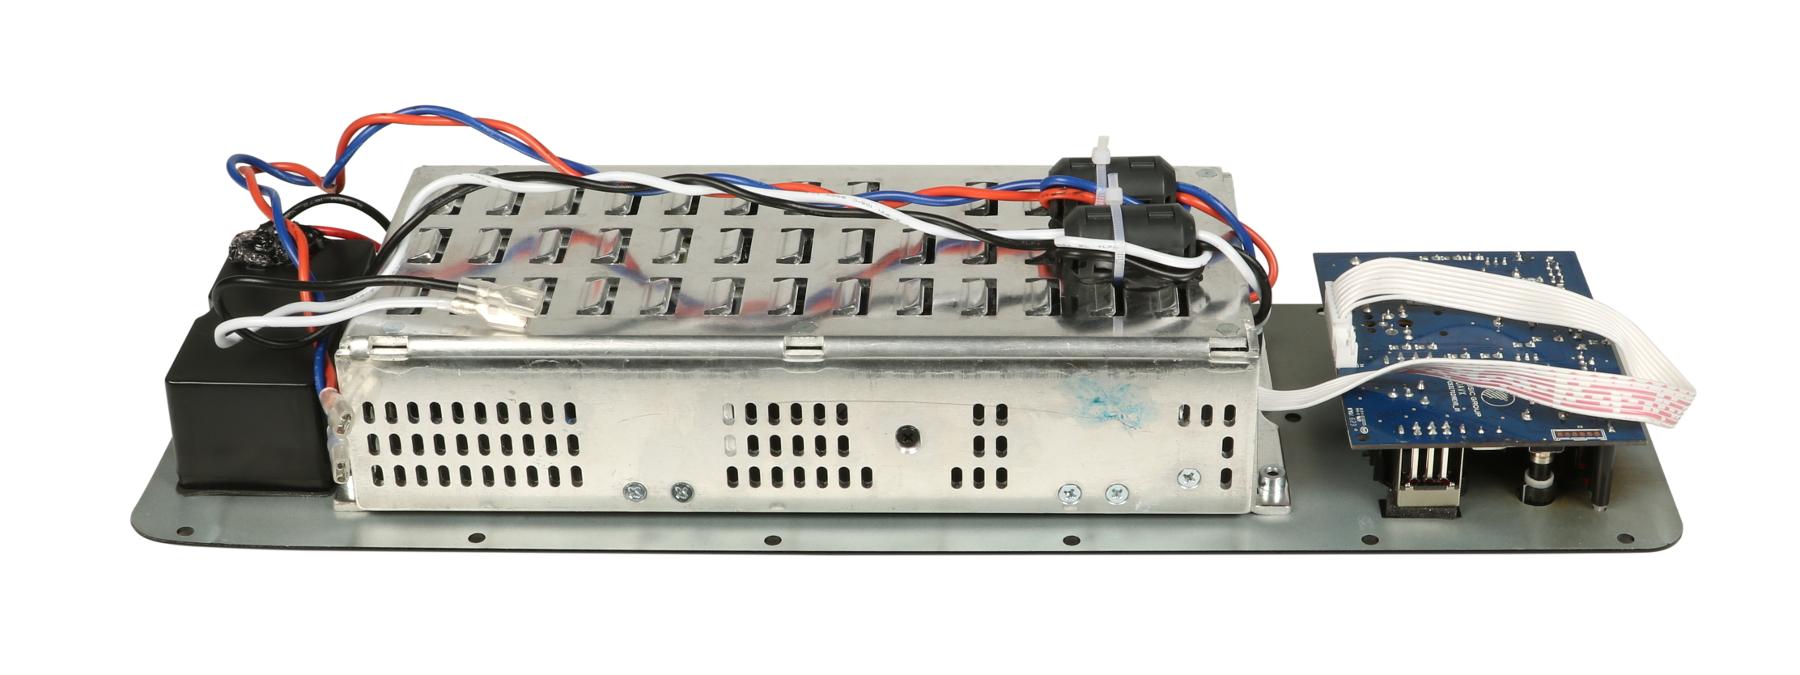 turbosound a09 auu02 00000 milan m12 amp module full compass. Black Bedroom Furniture Sets. Home Design Ideas